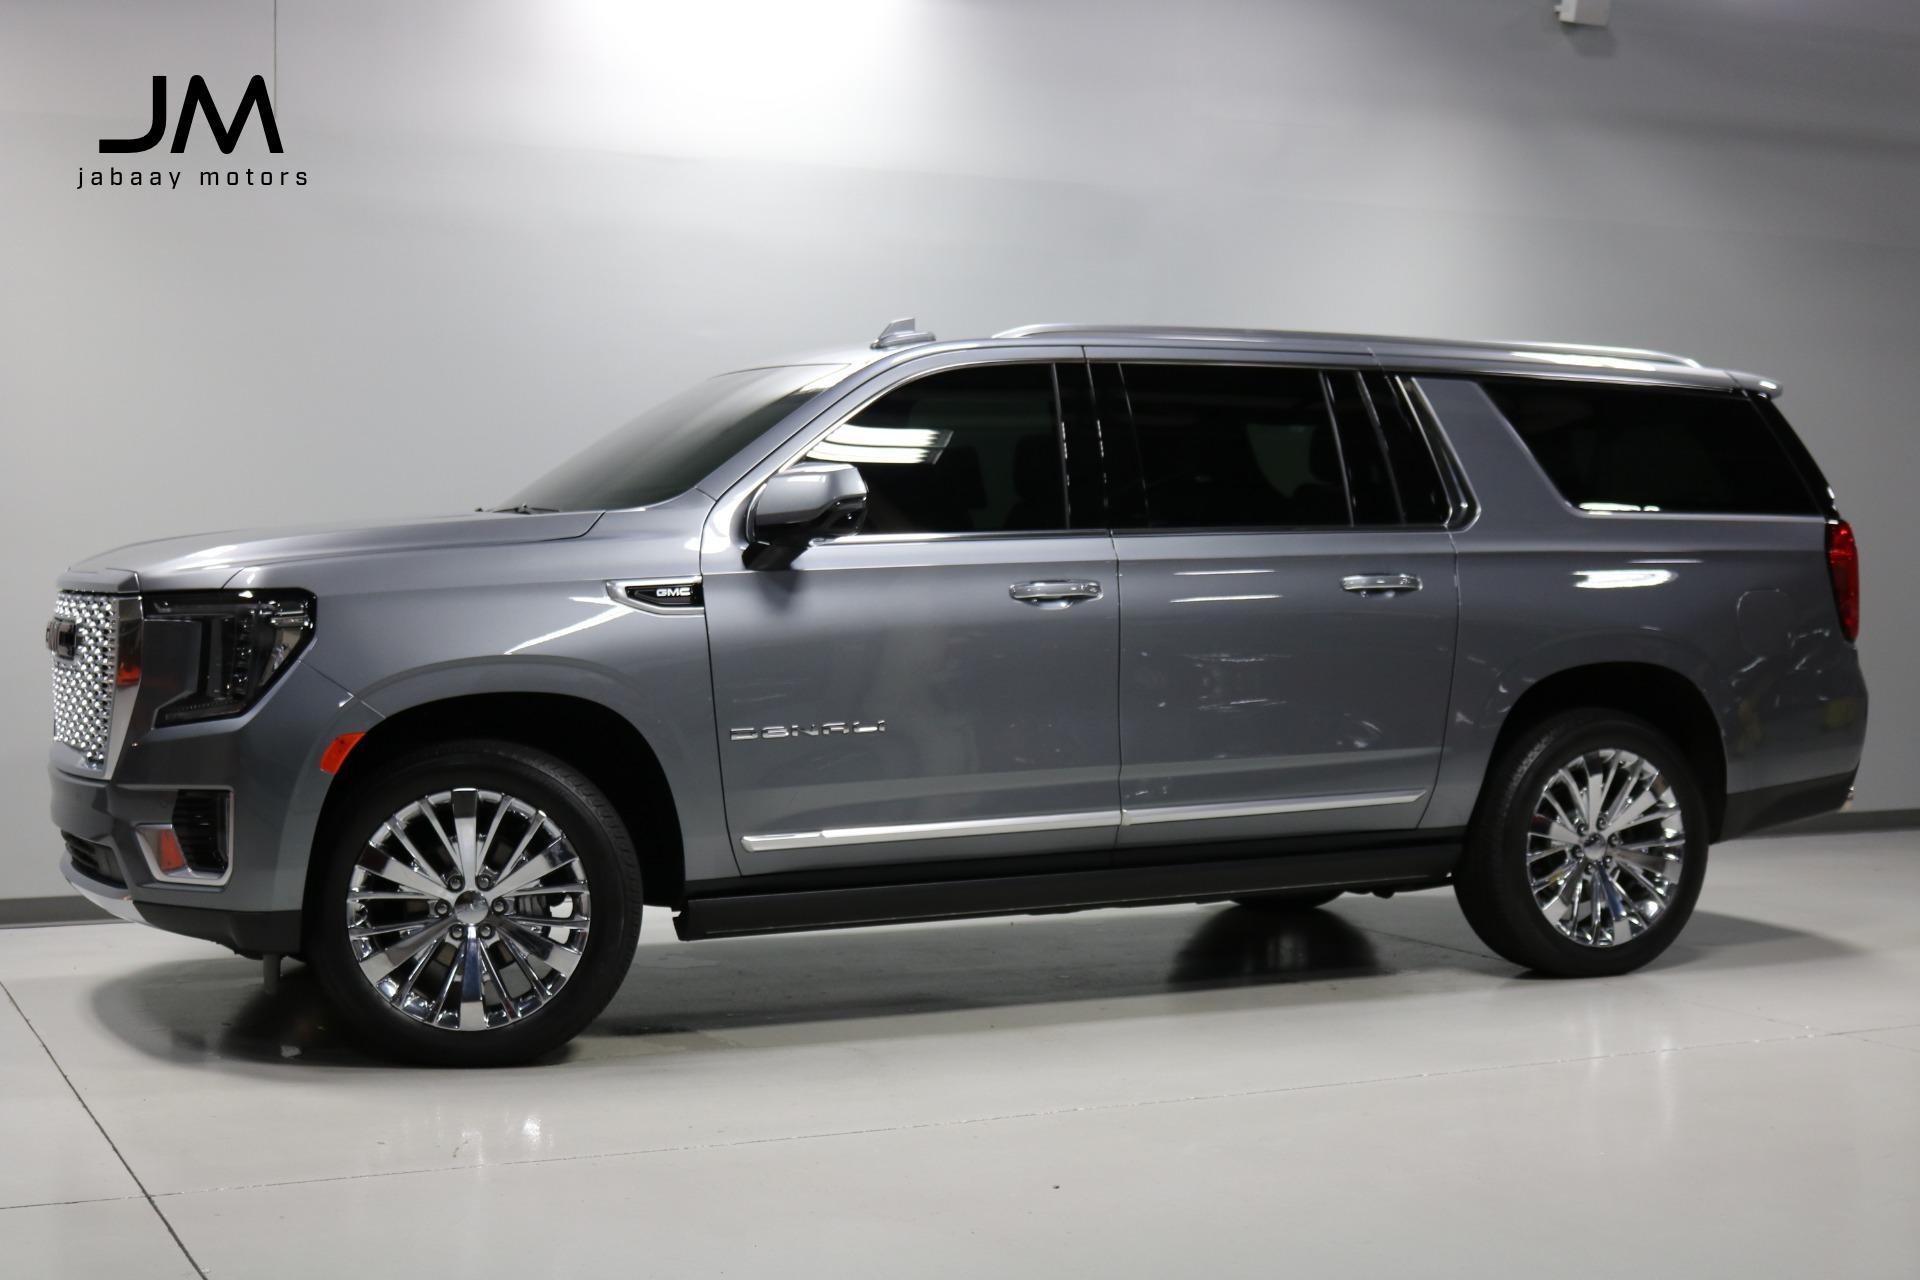 Used 2021 Gmc Yukon Xl Denali For Sale Sold Jabaay Motors Inc Stock Jm7492